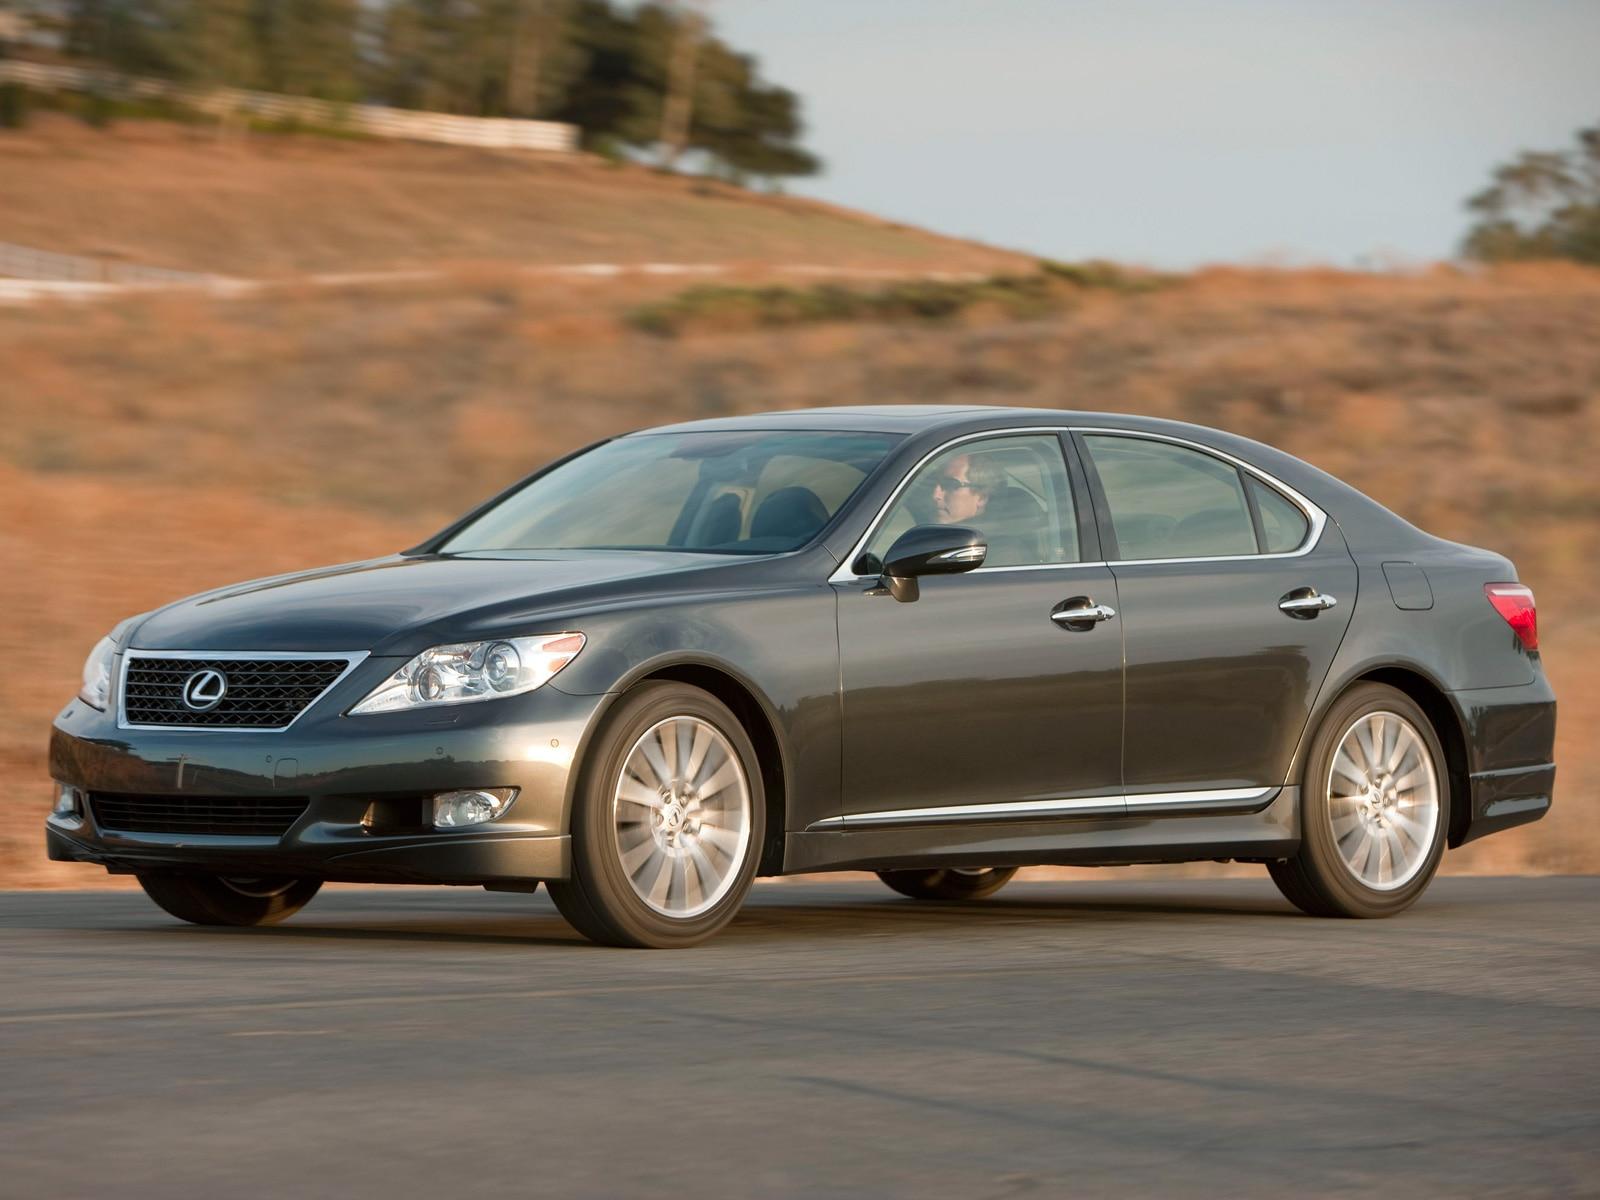 http://st.automobilemag.com/uploads/sites/11/2009/11/0911_08_z-2010_lexus_lS_460_sport-front_three_quarter_view.jpg